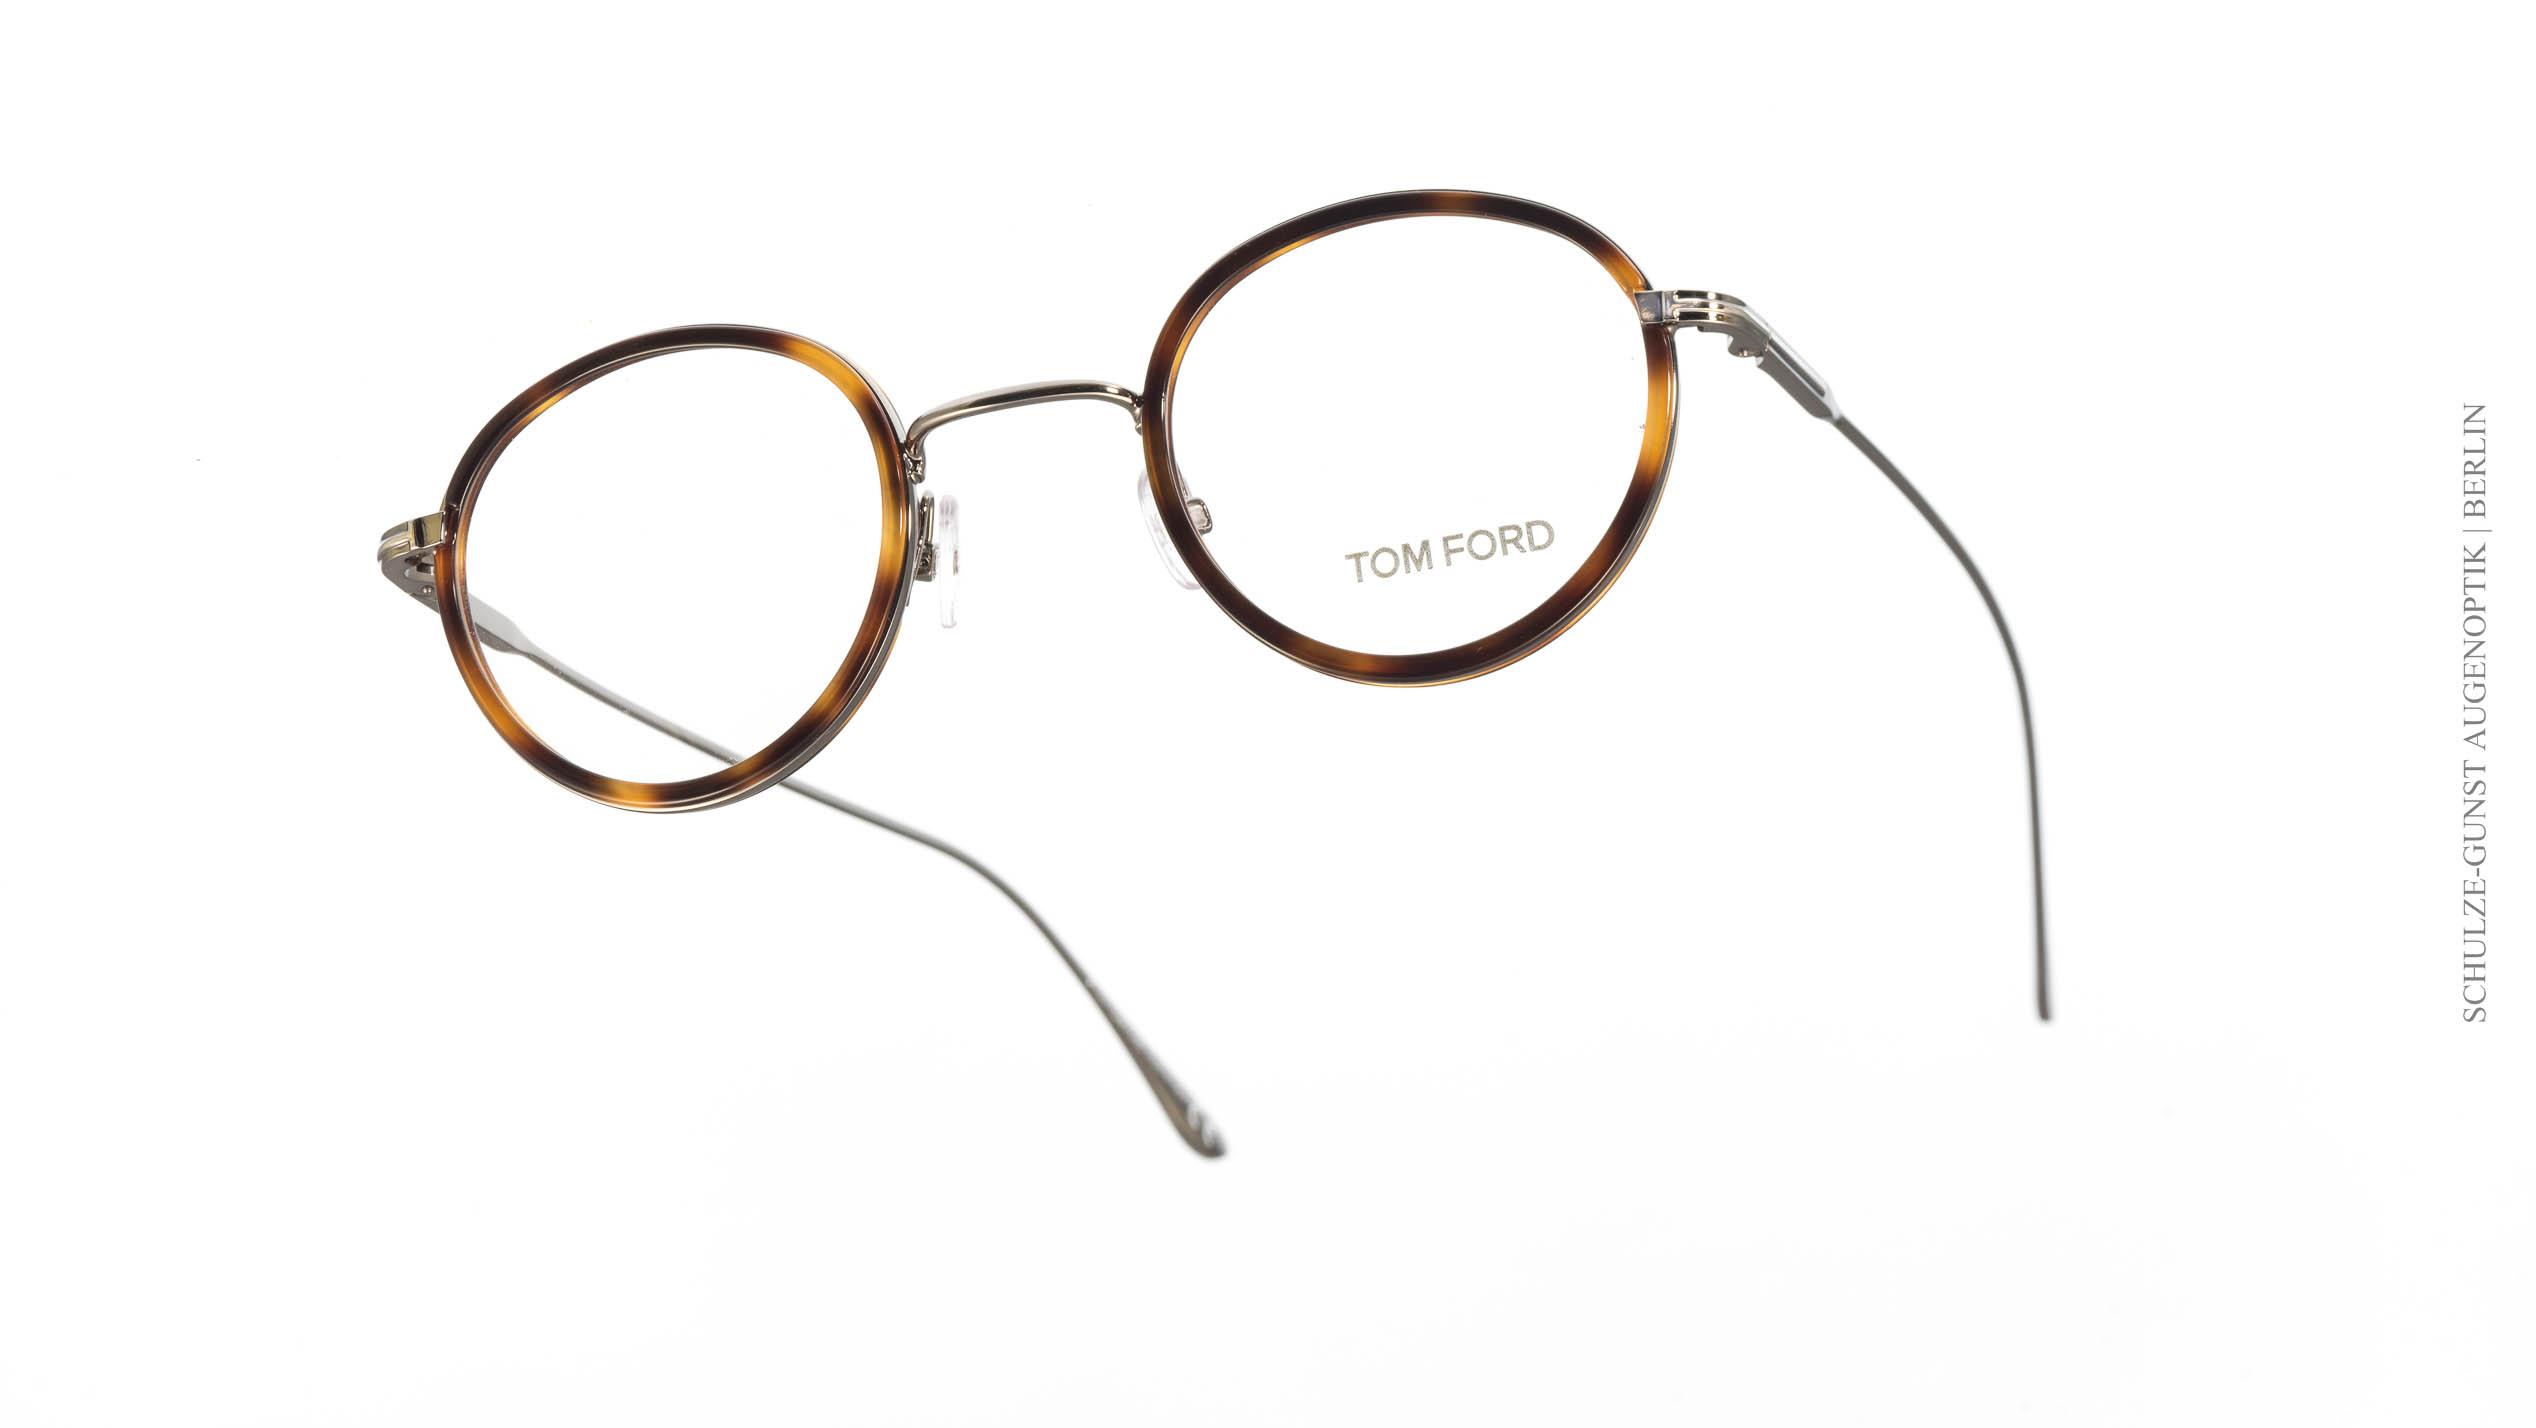 West Herr Ford >> tom-ford-herrenbrille Archive - SCHULZE-GUNST Augenoptik seit 1894